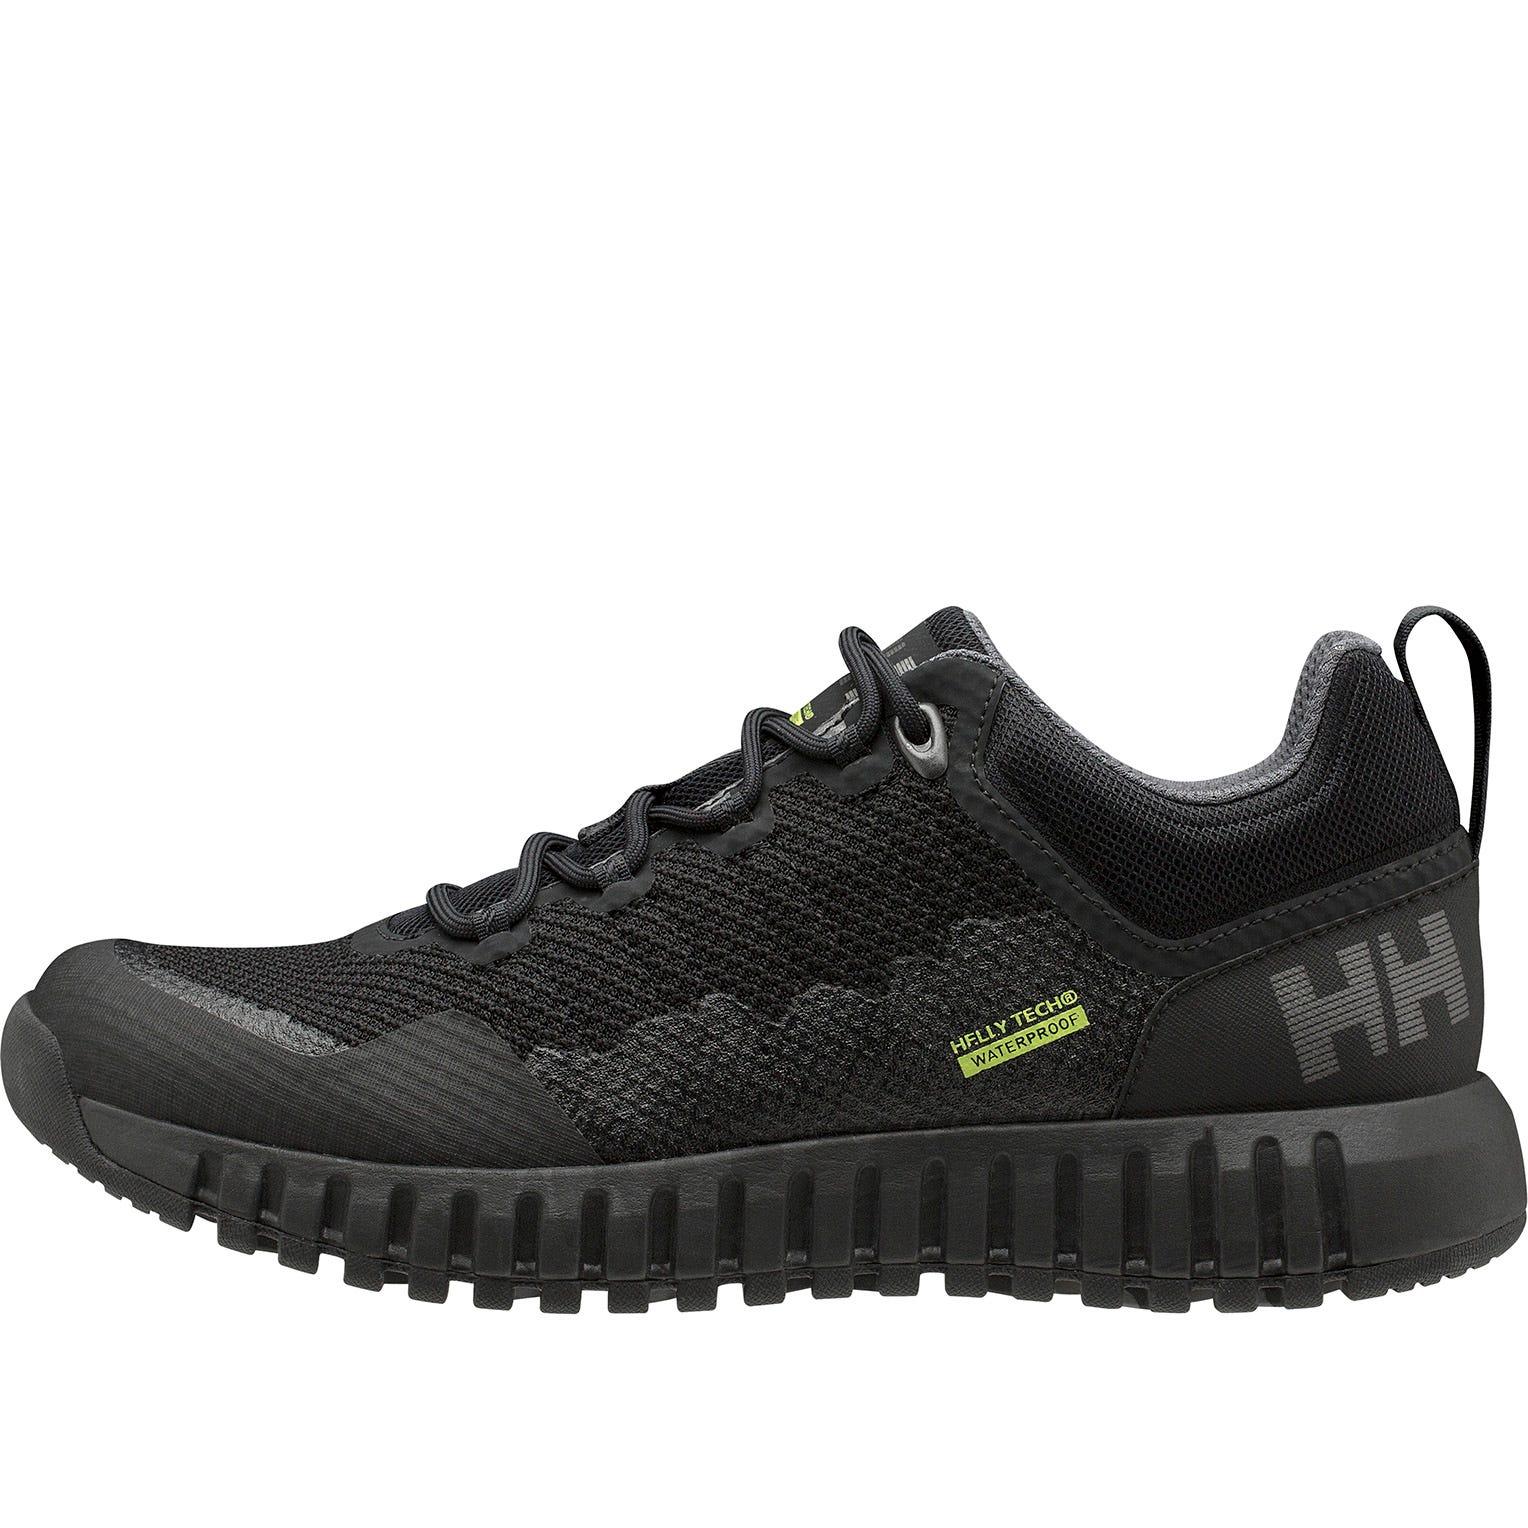 Helly Hansen Vanir Hegira Ht Mens Hiking Boot Black 46/11.5